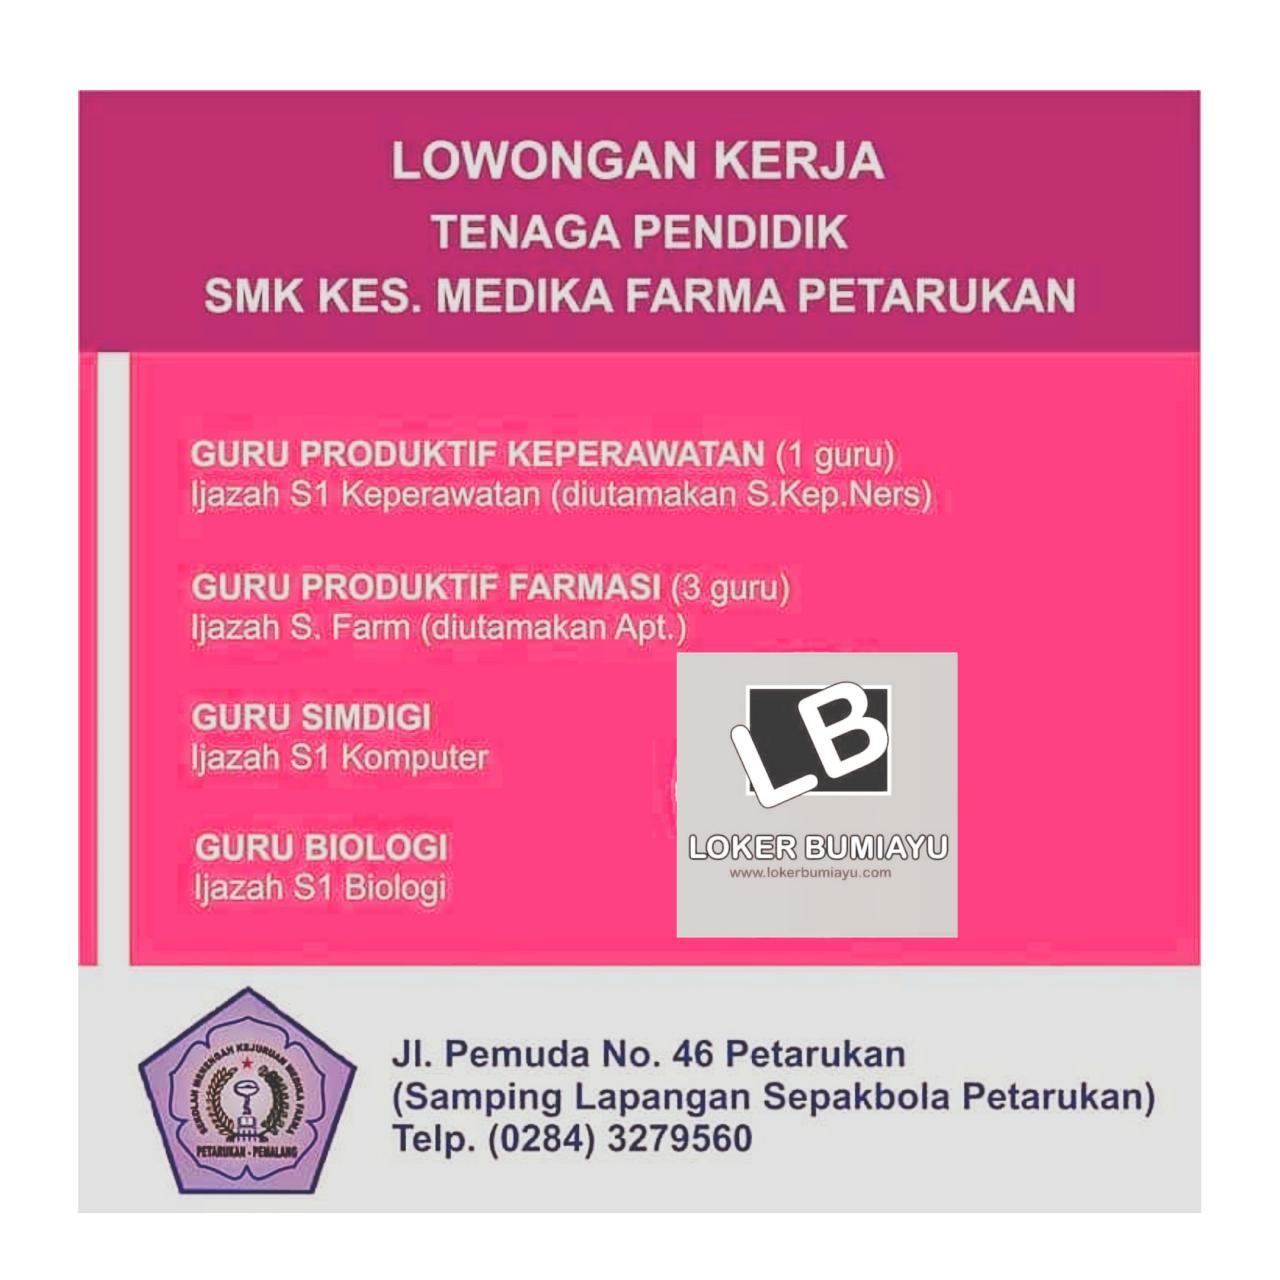 SMK Kesehatan Medika Farma Petarukan